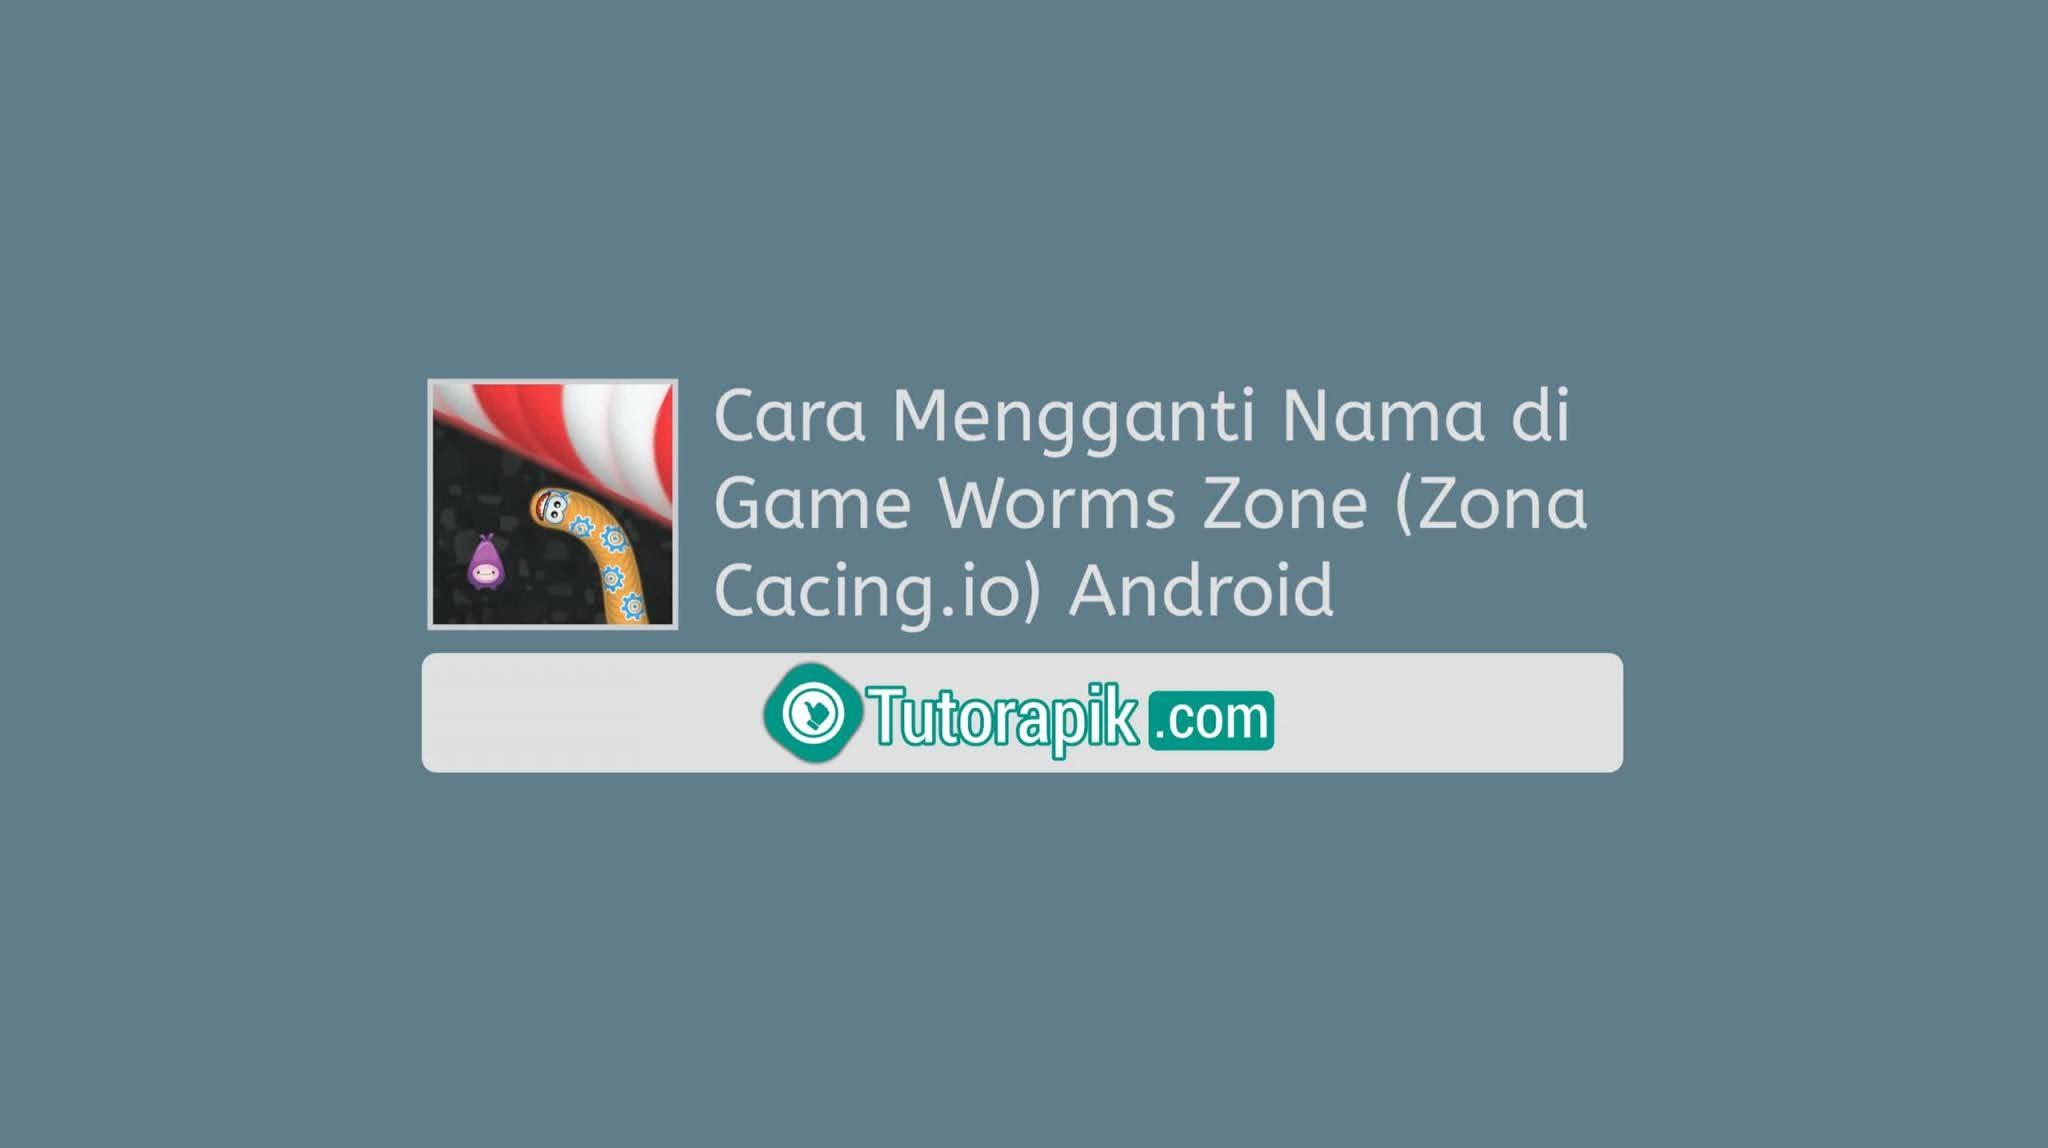 Cara Mengganti Nama di Game Worms Zone (Zona Cacing.io) Android